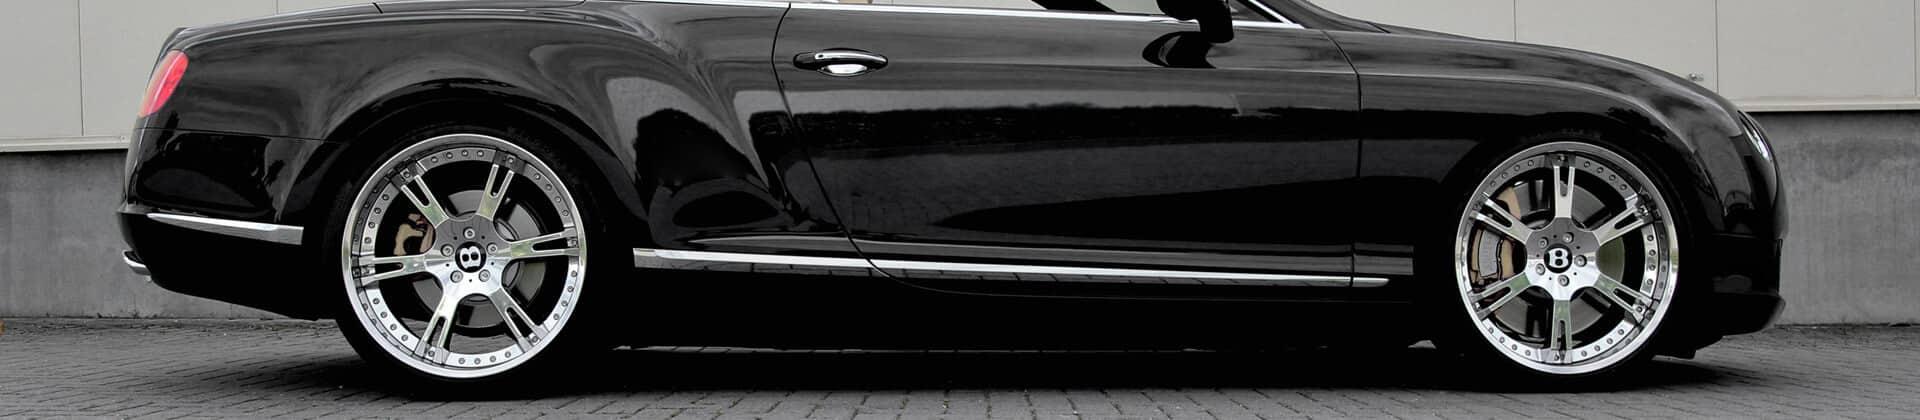 Bentley leistungssteigerung